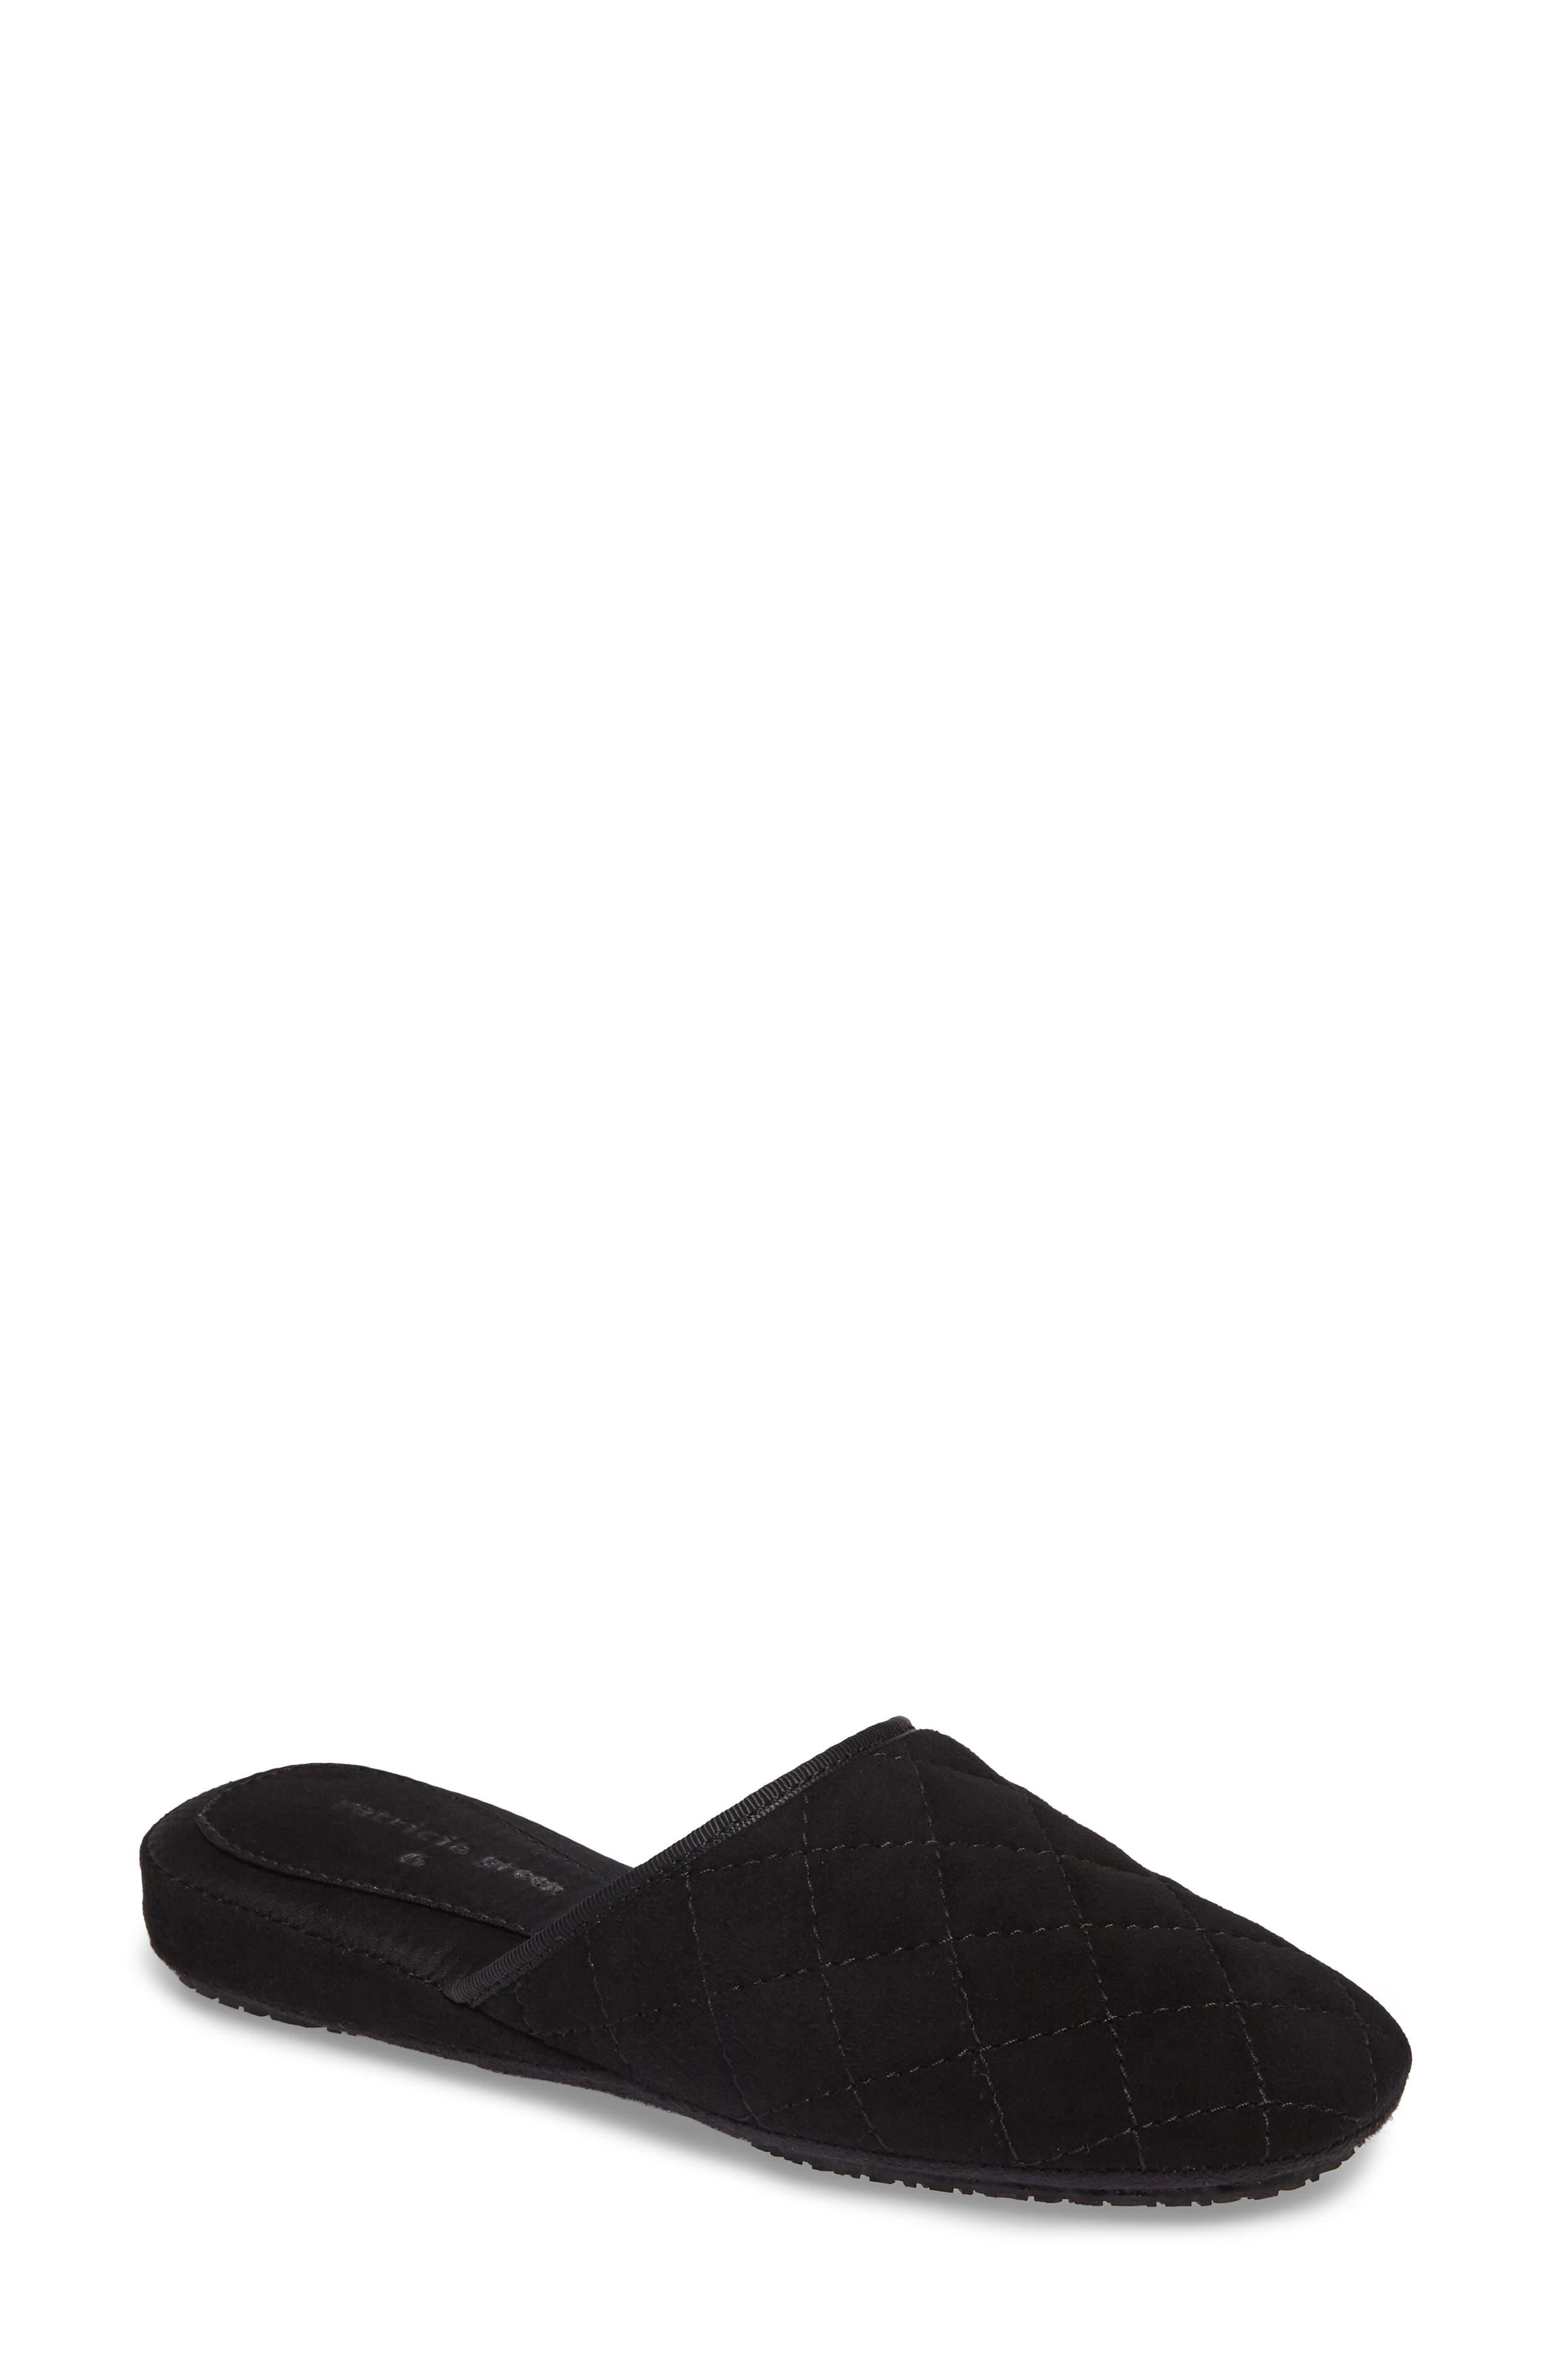 Coco Slipper,                         Main,                         color, BLACK SUEDE